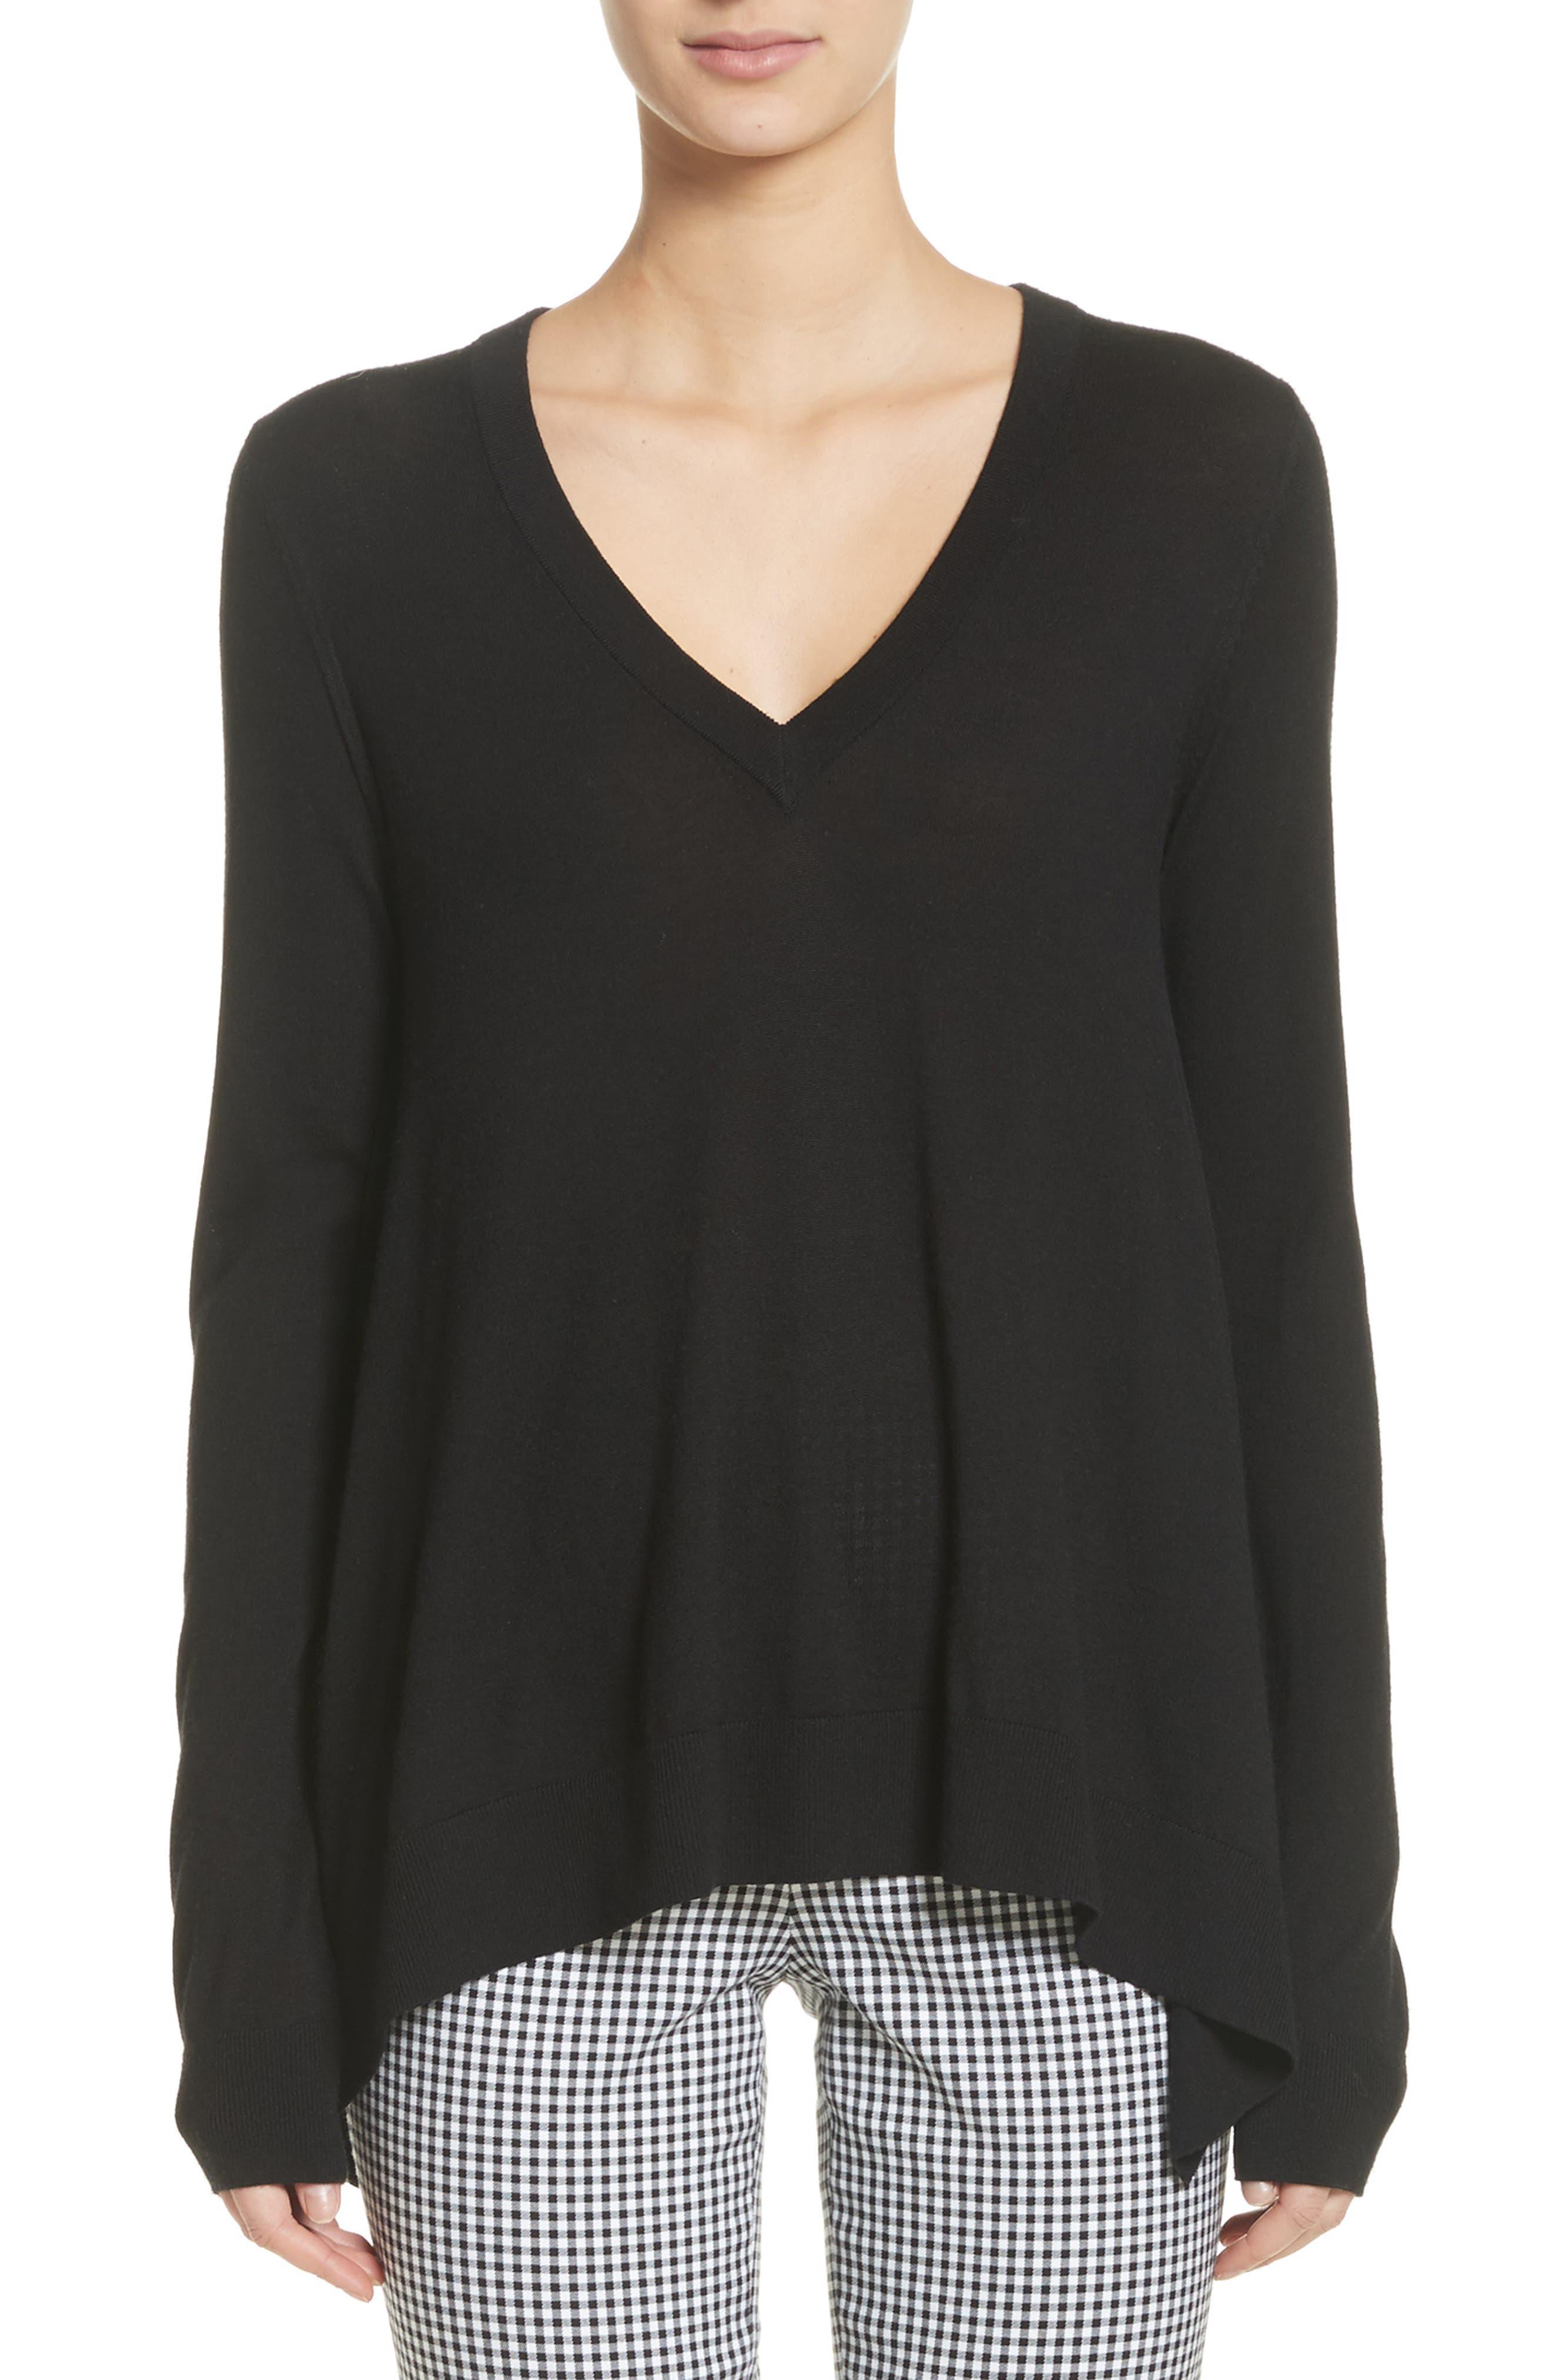 Michael Kors Draped Wool, Silk & Cashmere Sweater